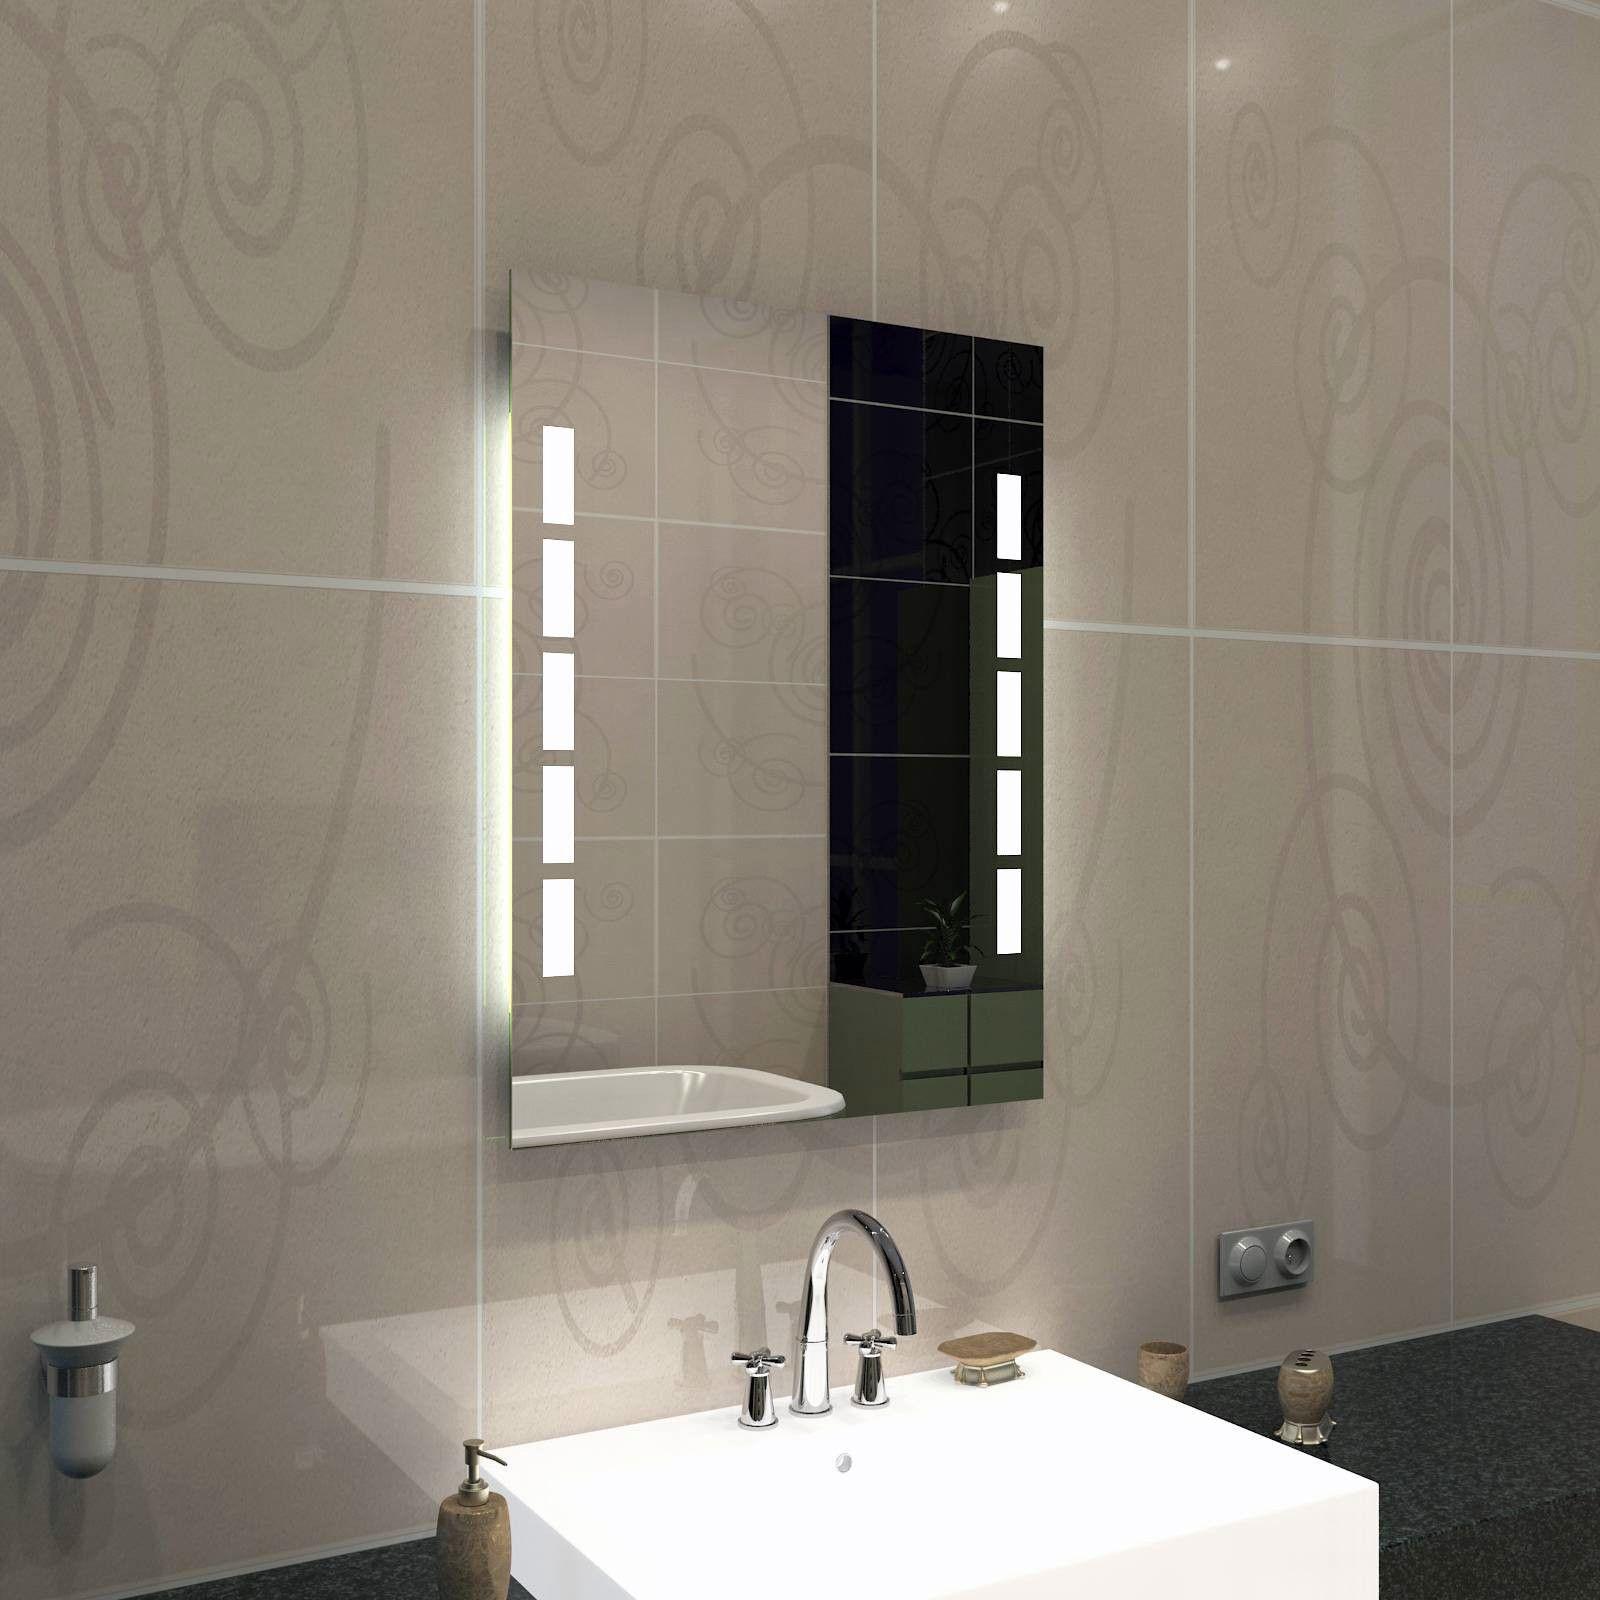 Badezimmer Ablage Holz Bathroom Mirror Bathroom Lighting Lighted Bathroom Mirror